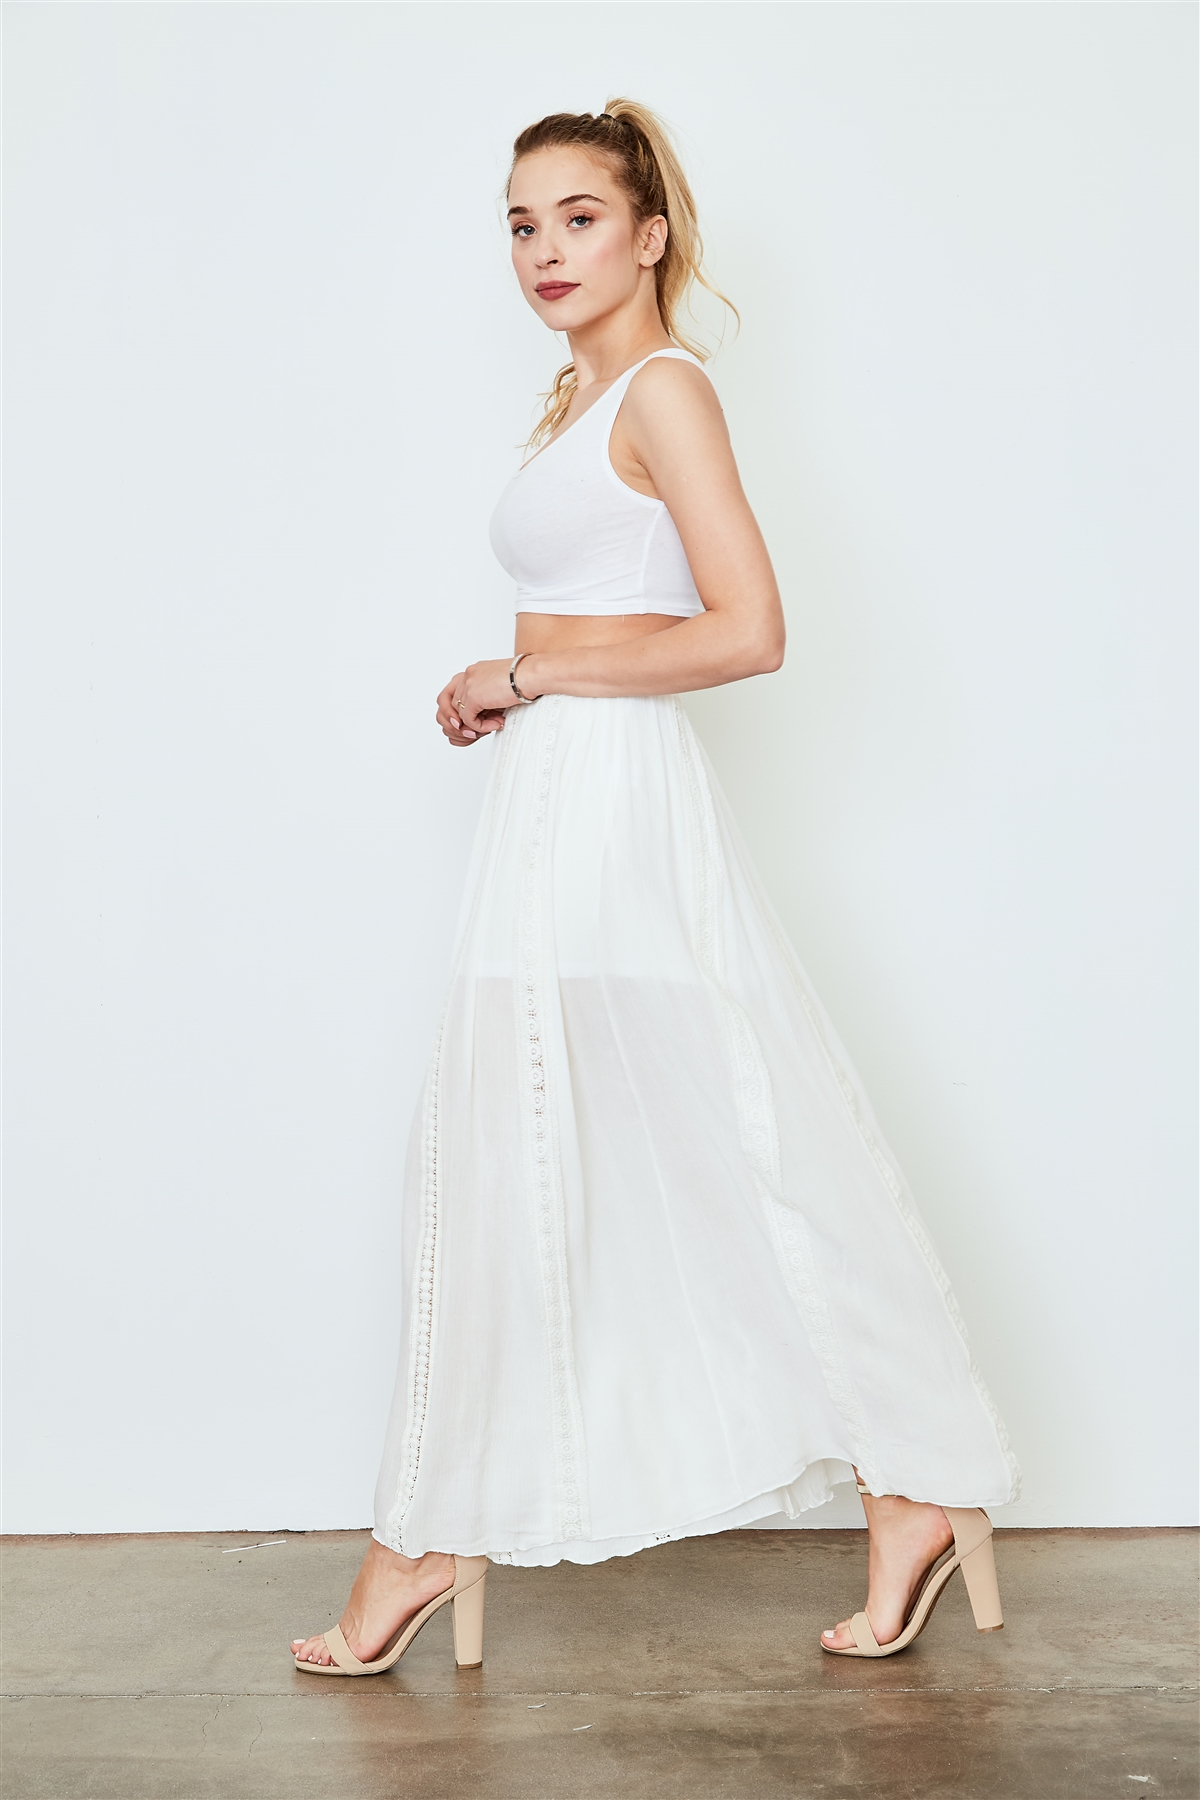 47bda2295bdf5 Off White Floral Lace Crochet Trim Maxi Skirt /2-3-2